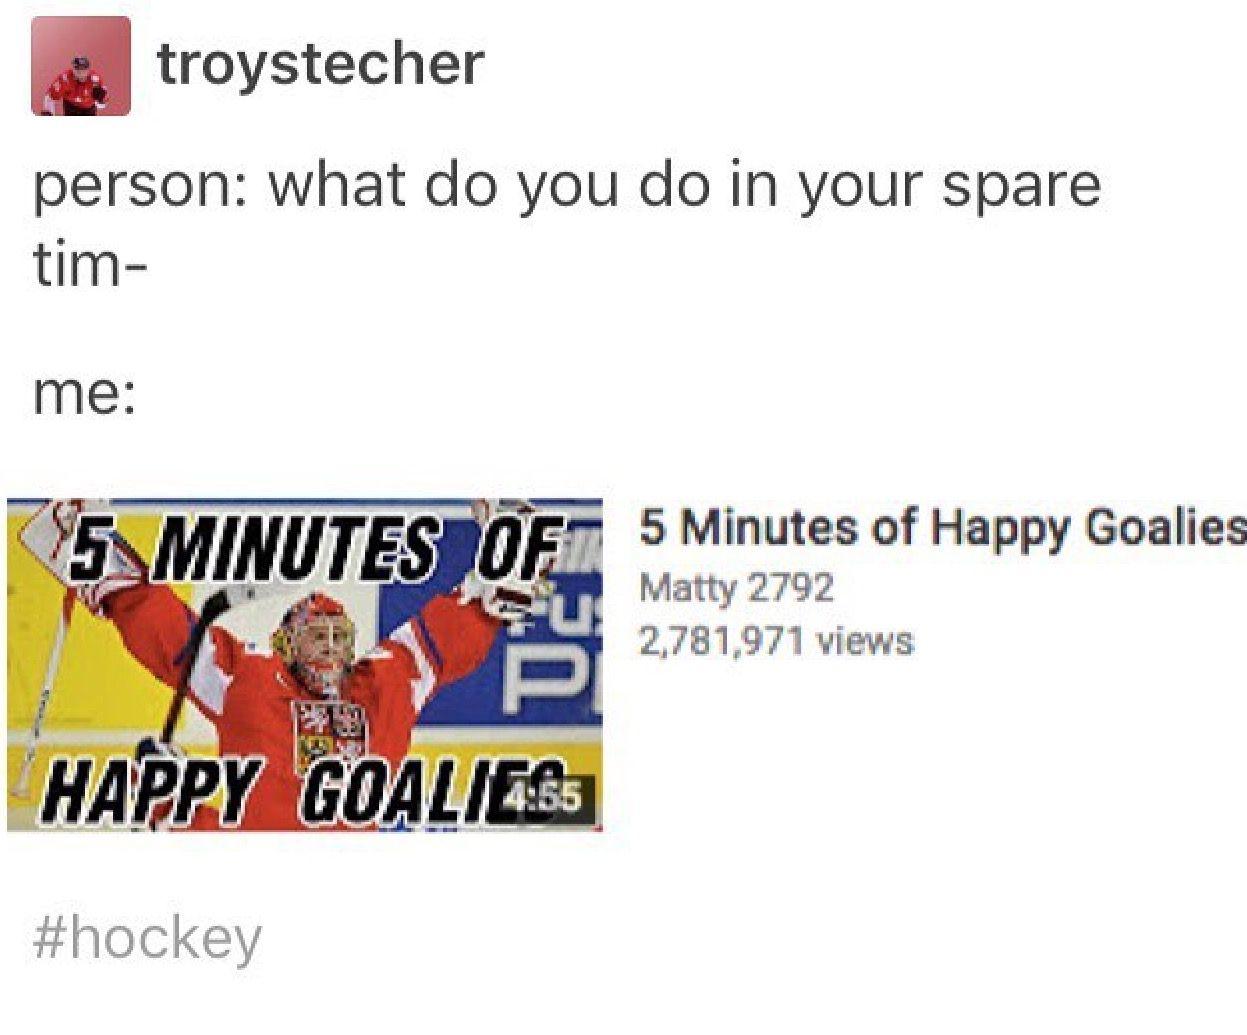 Happy goalies make ME happy. They deserve happiness.